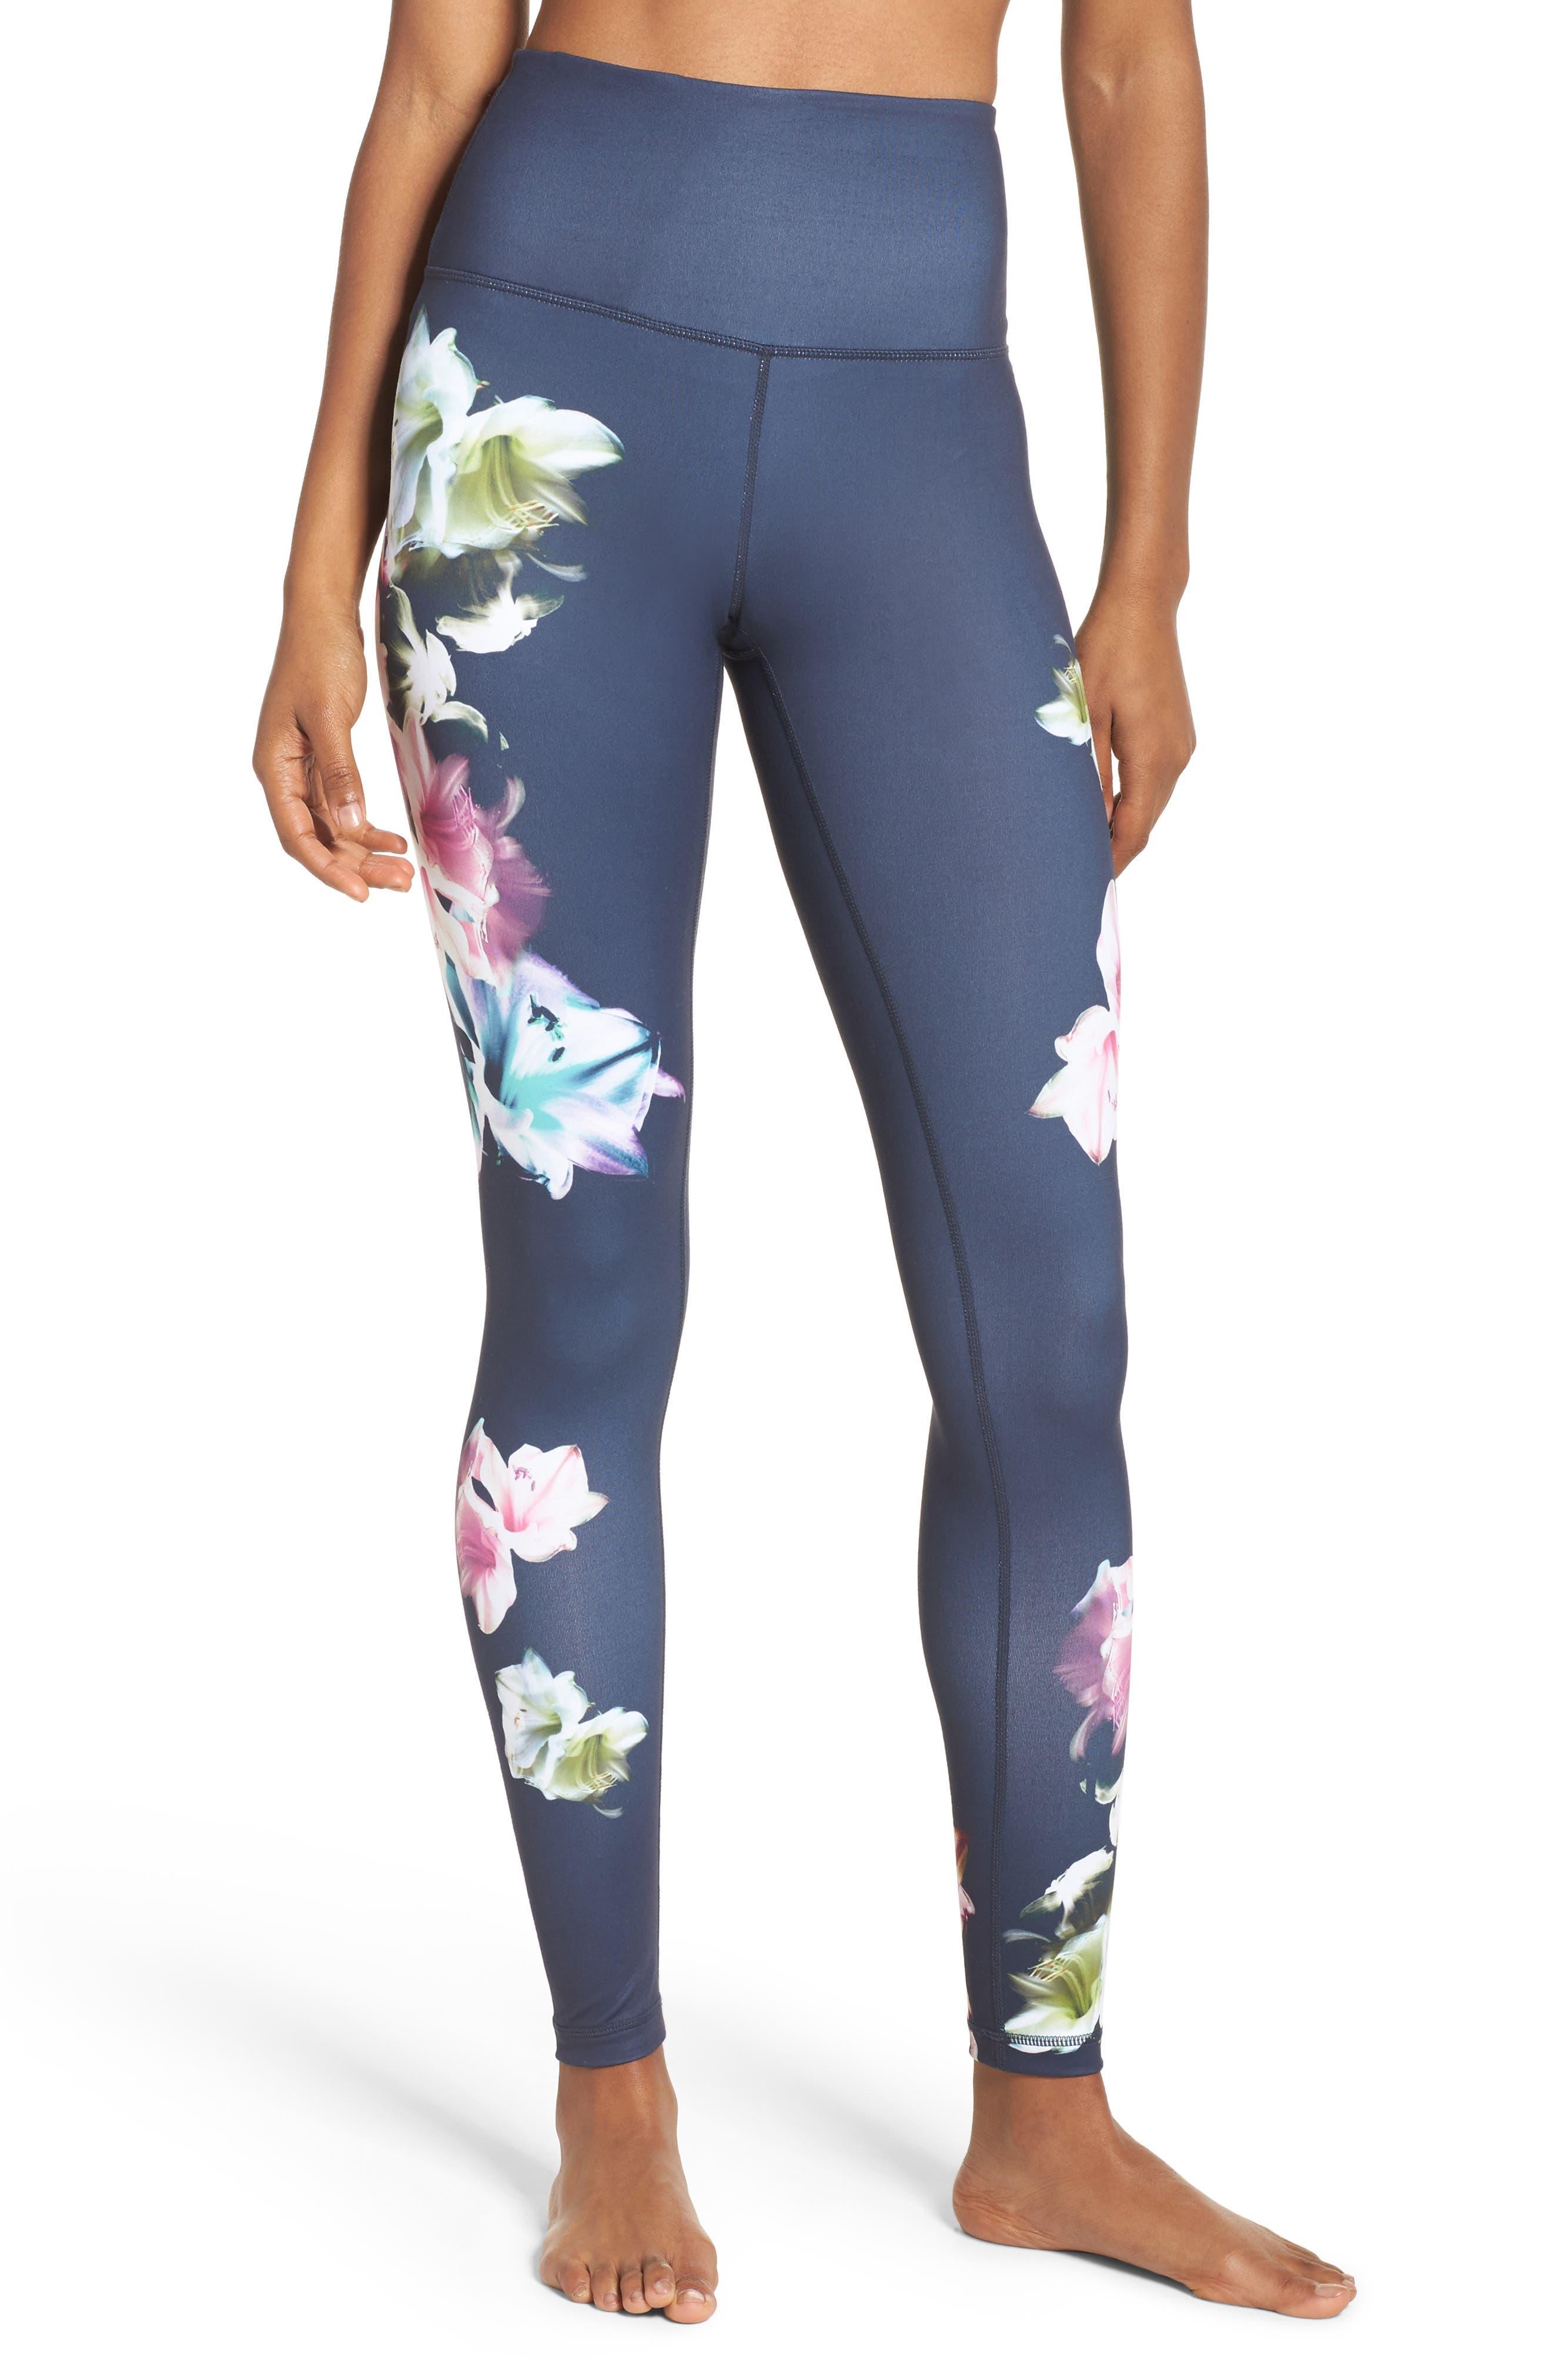 Pure Floral Ink High Waist Leggings,                         Main,                         color, Grey Slate Floral Engineer Prt